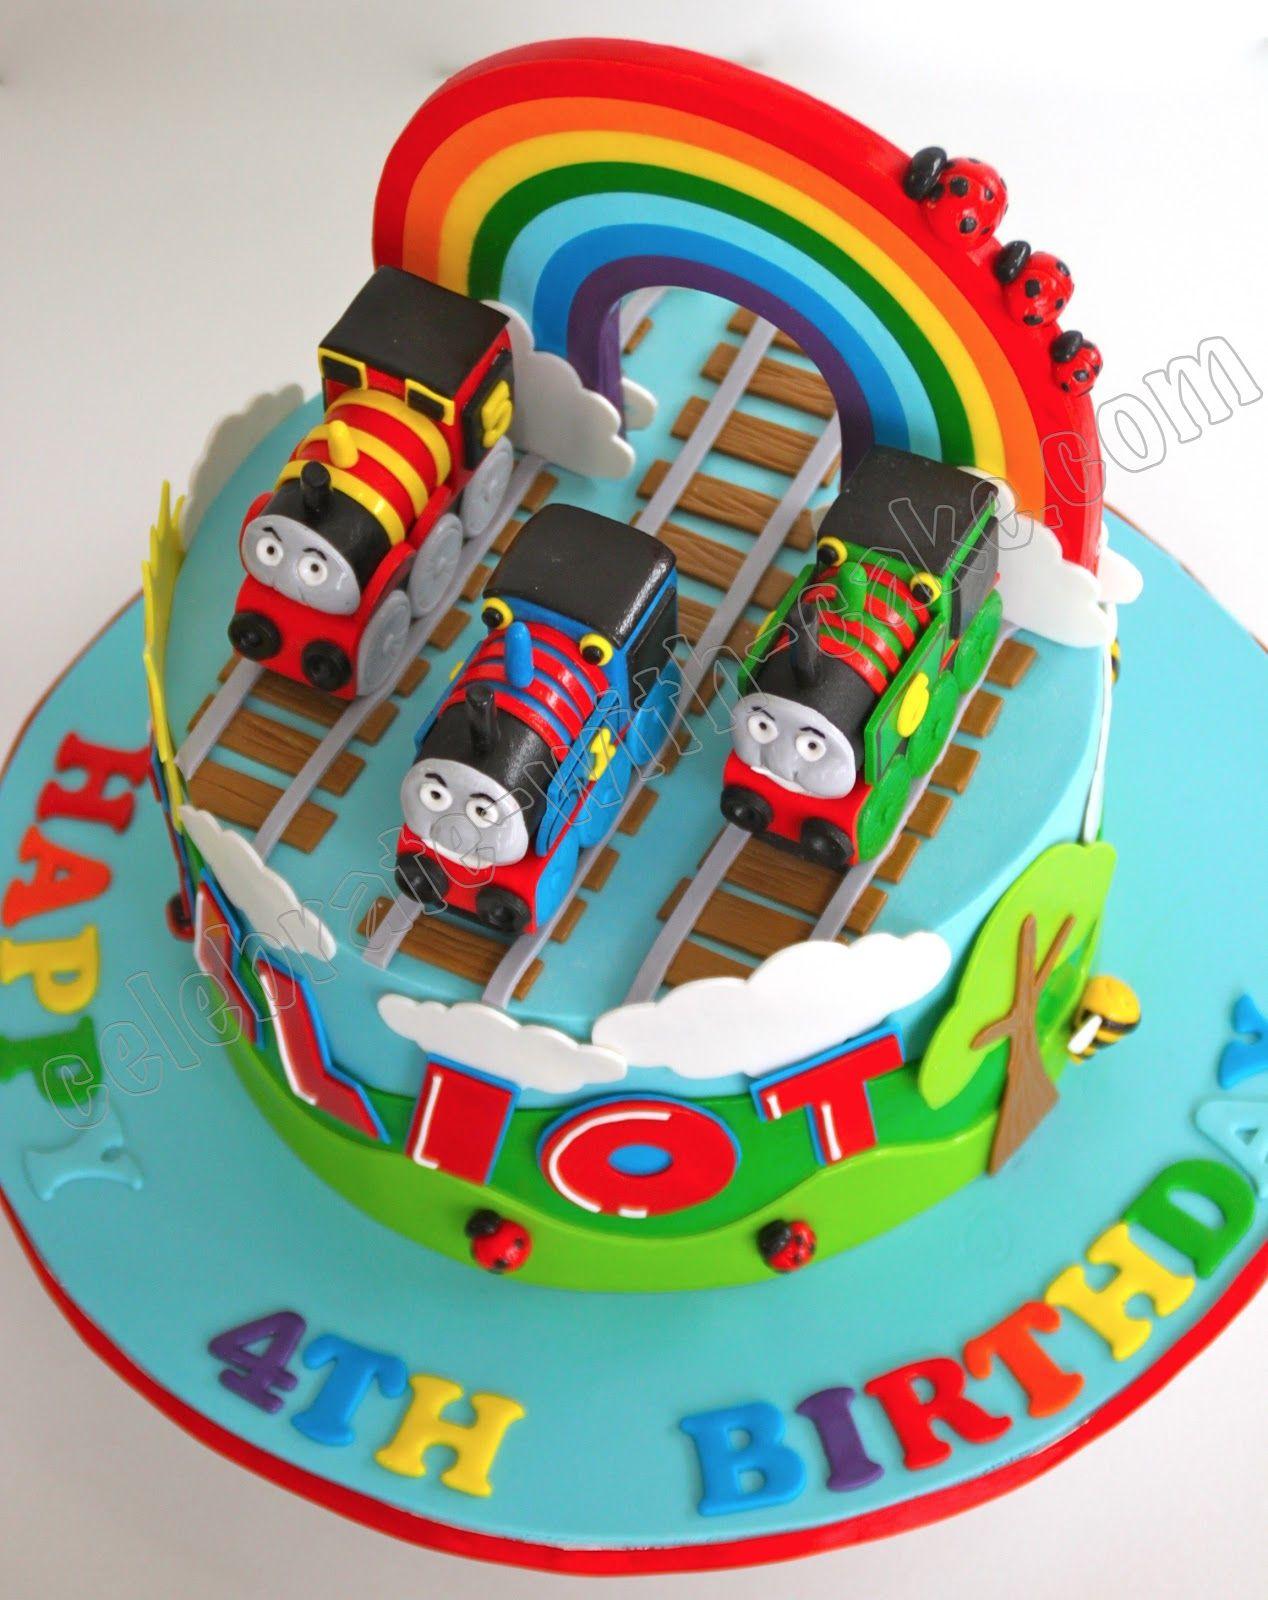 Celebrate With Cake Rainbow Thomas The Tank Engine Cake